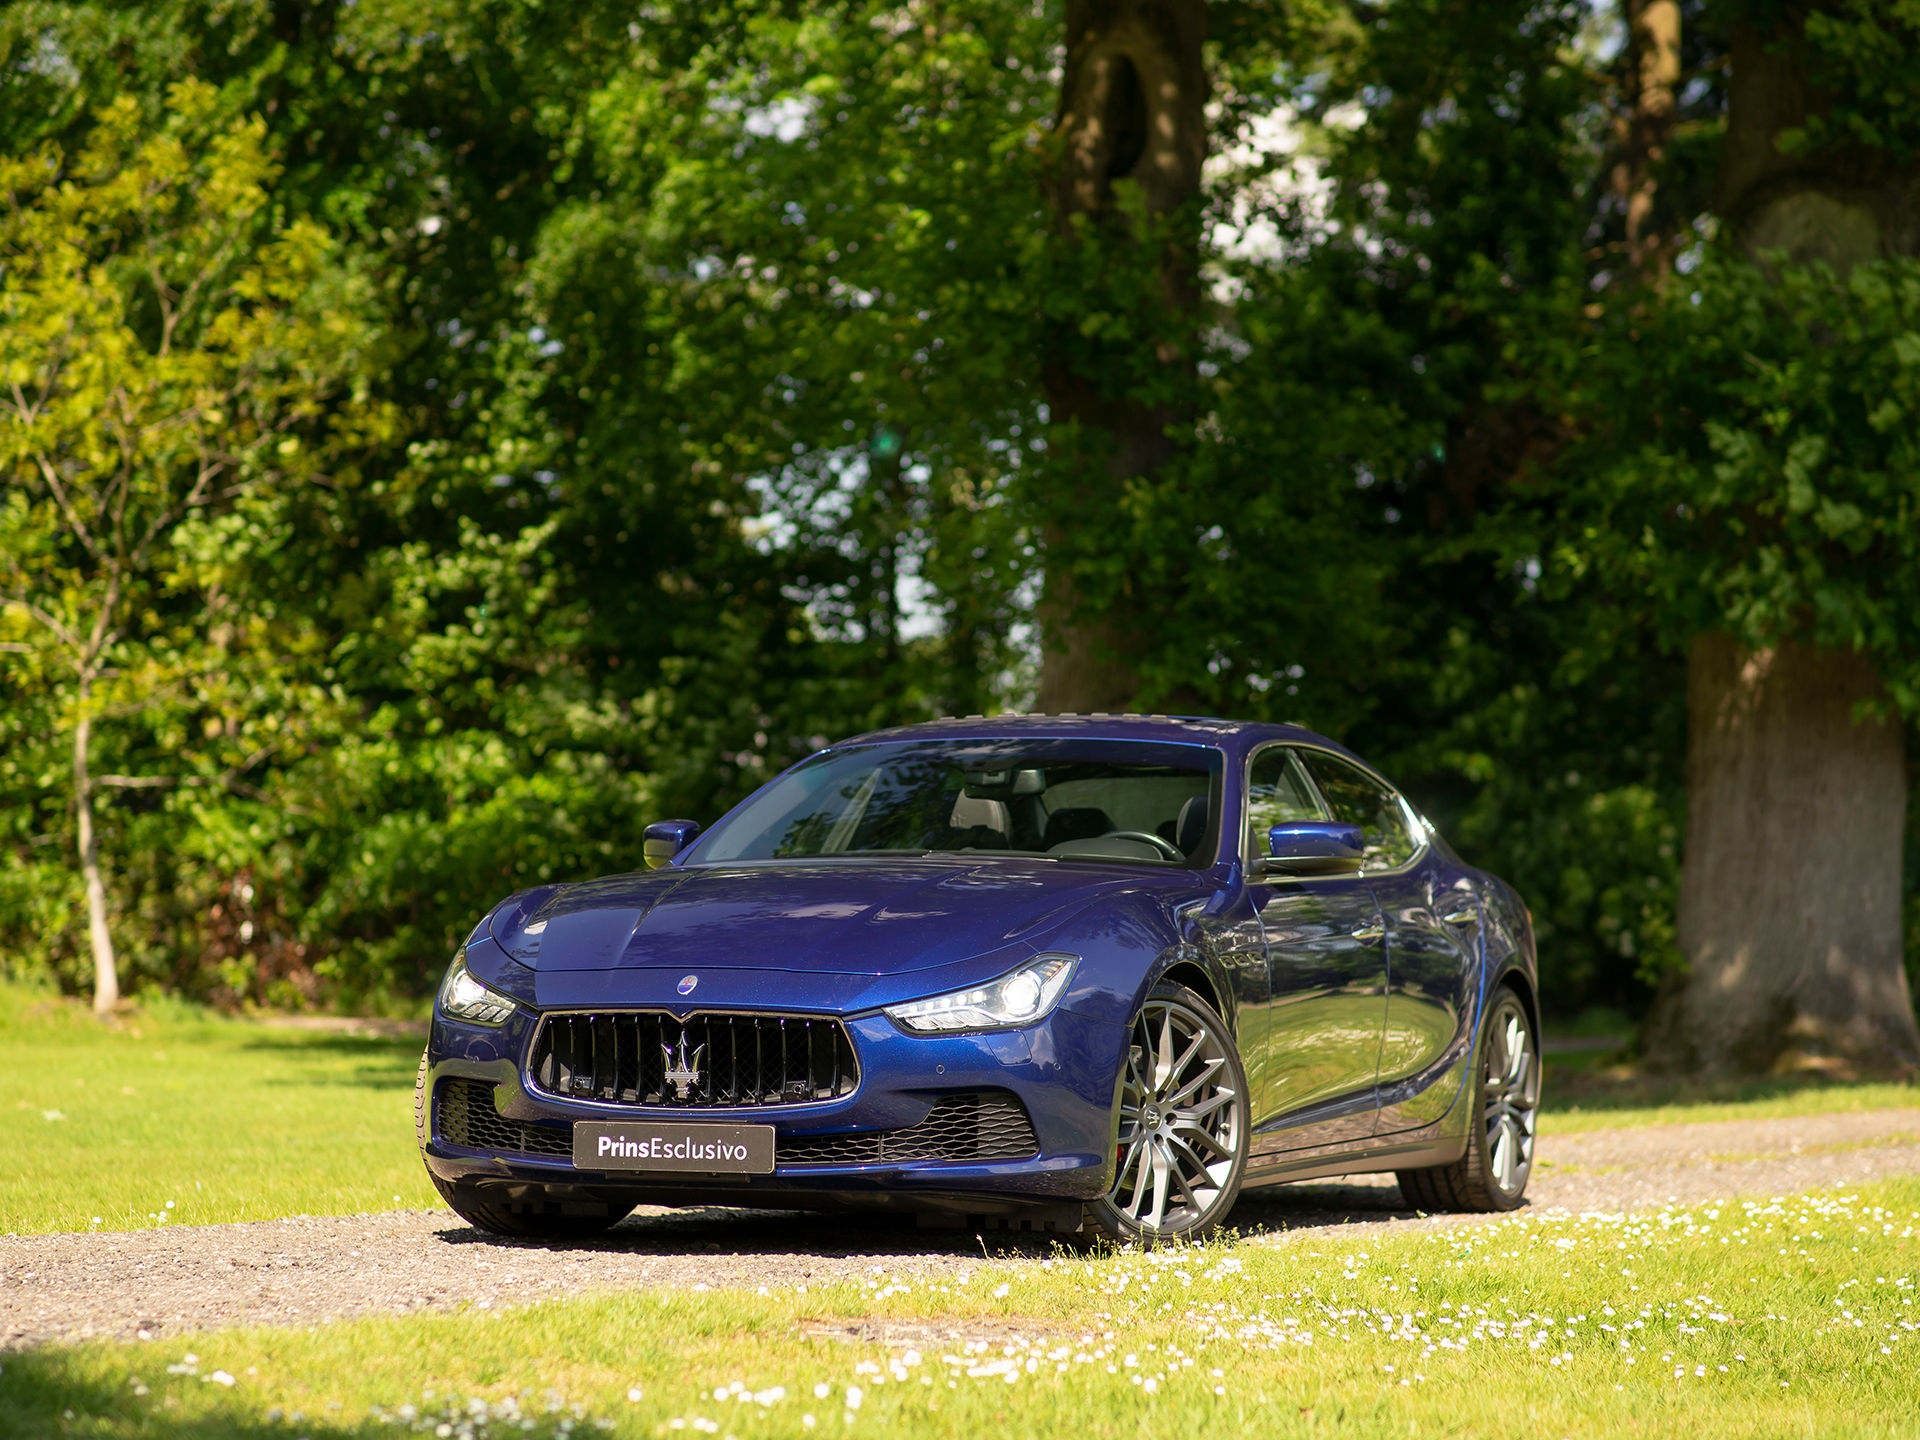 Tweedehands Maserati Ghibli occasion